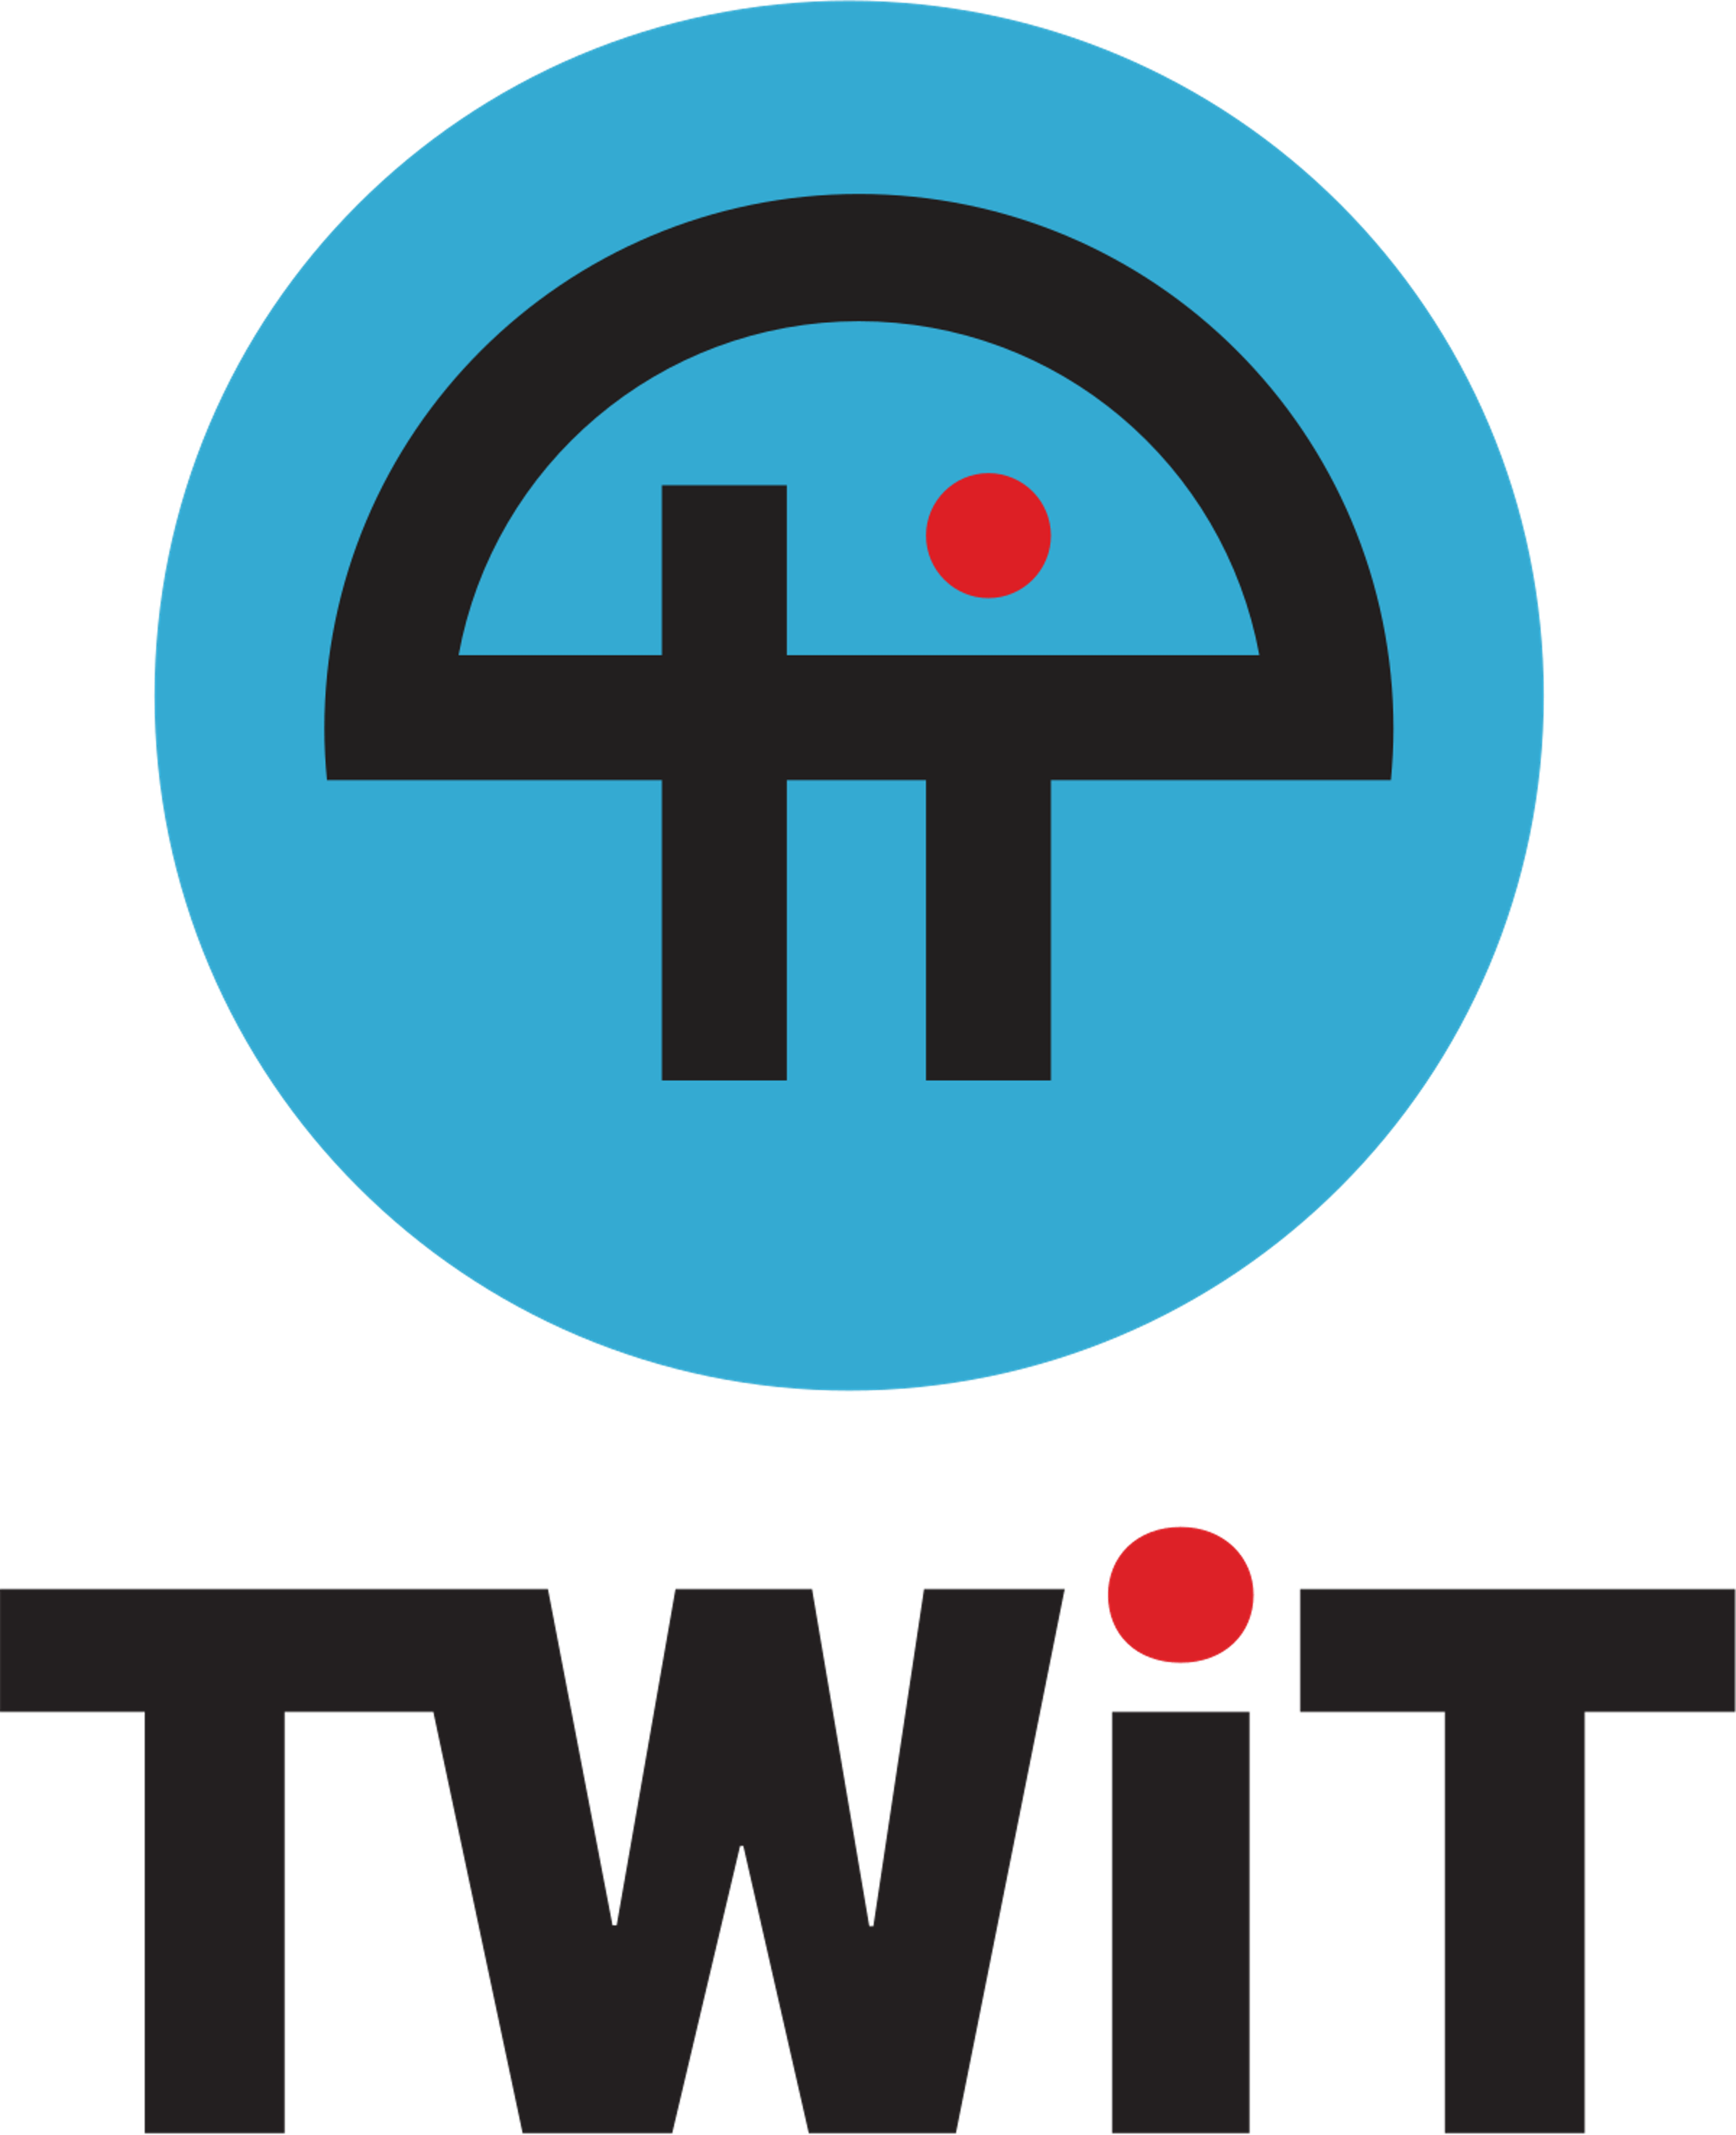 TWiET Riot logo